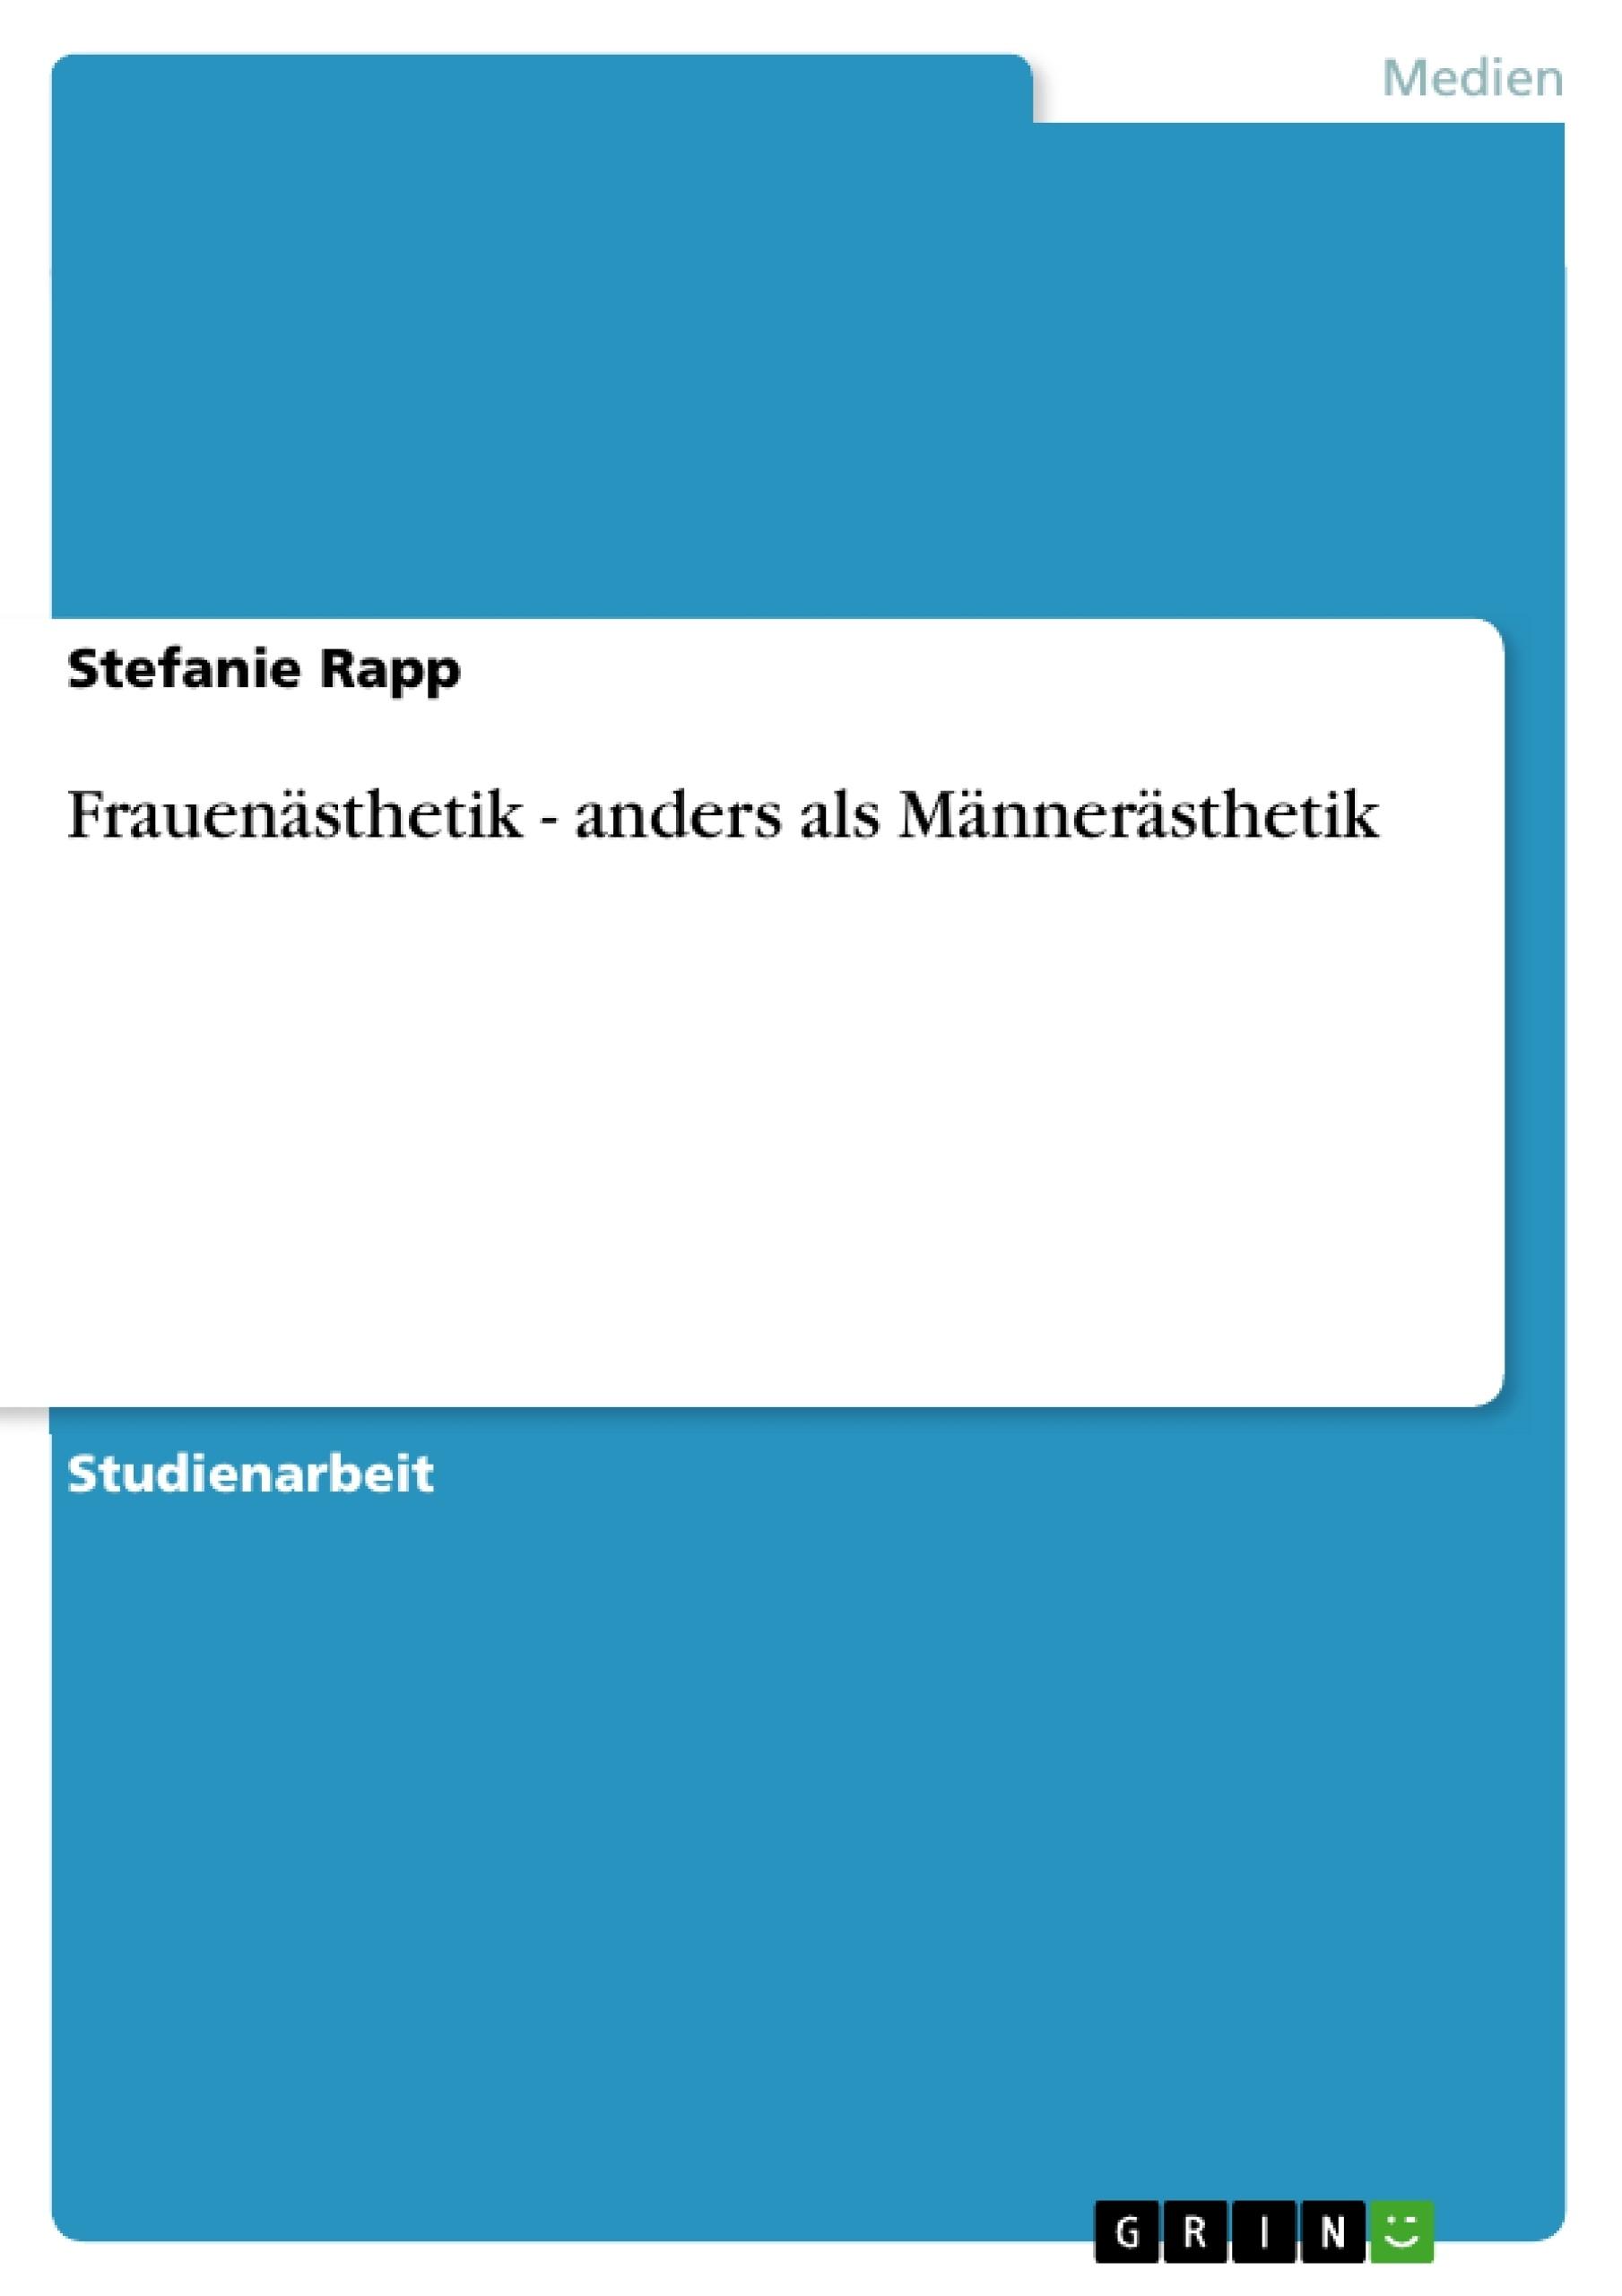 Titel: Frauenästhetik - anders als Männerästhetik